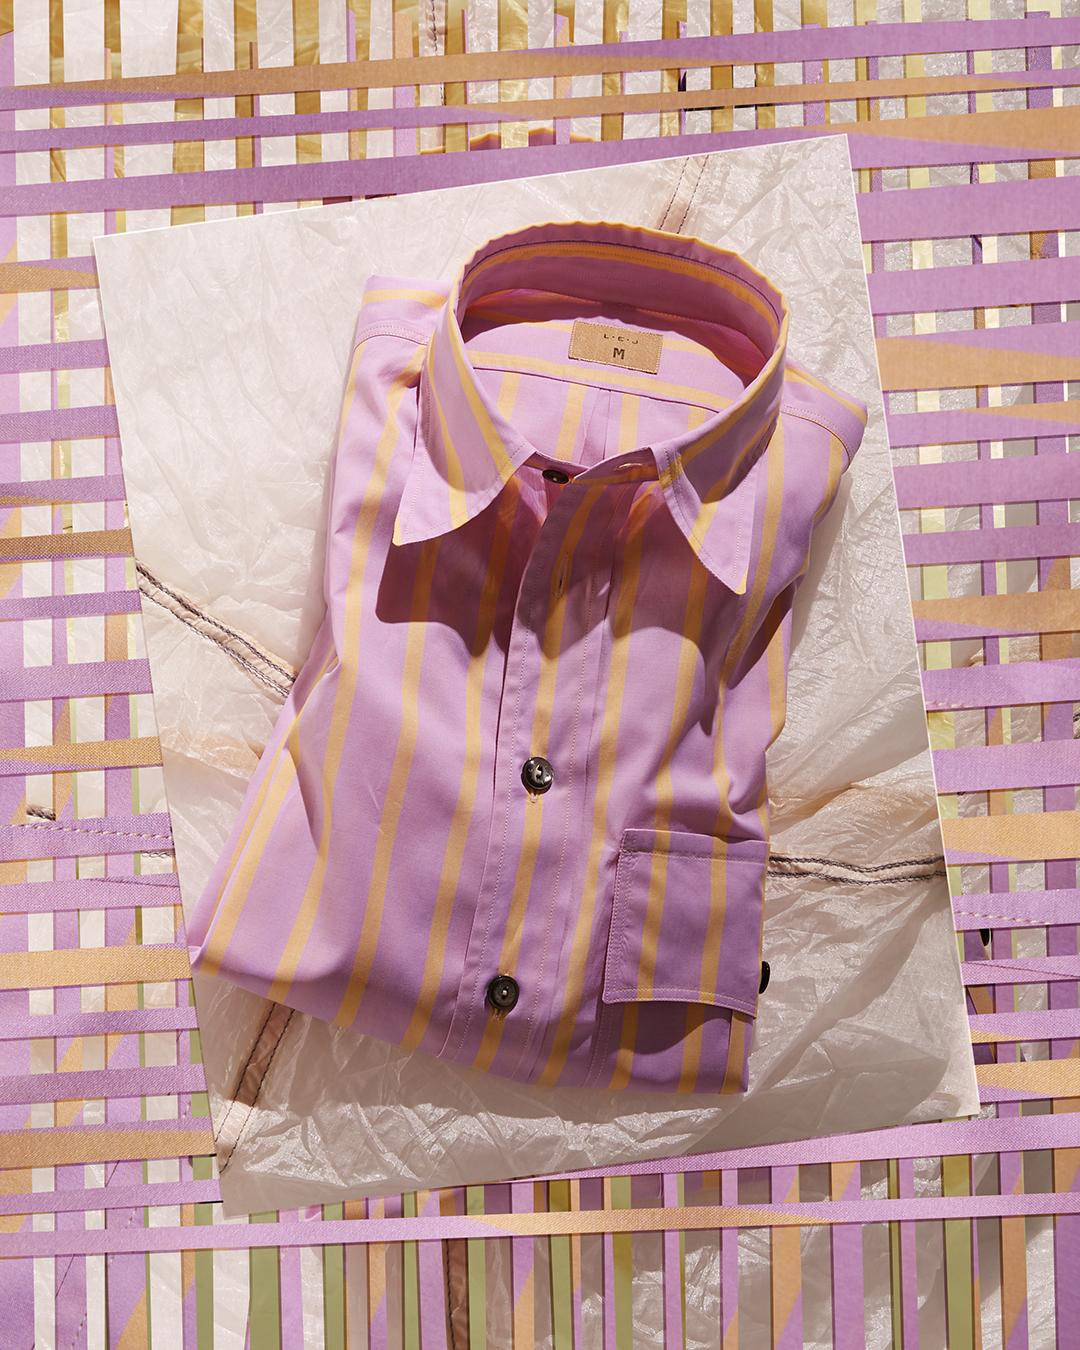 ! Pocket Officer's Shirt Rhubarb and Custard